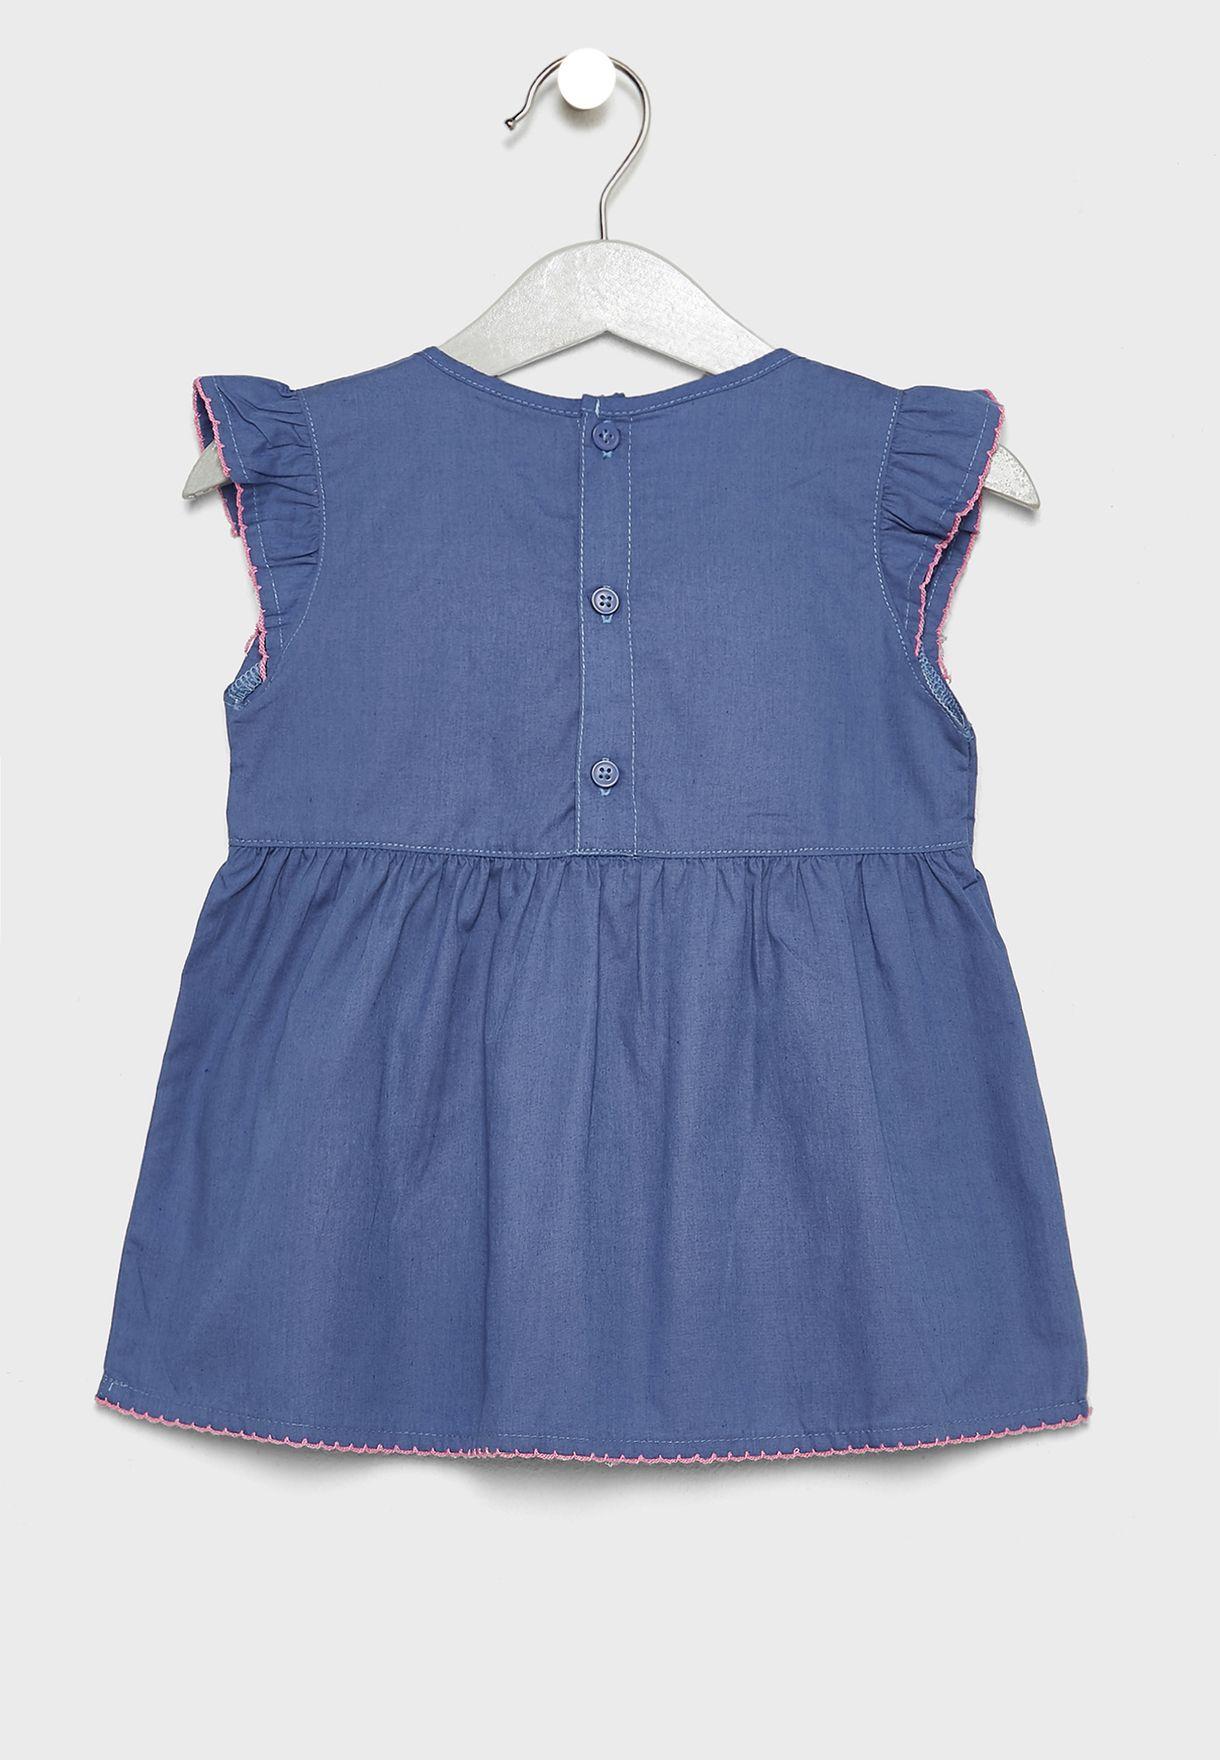 Infant Embroidered Dress + Leggings Set